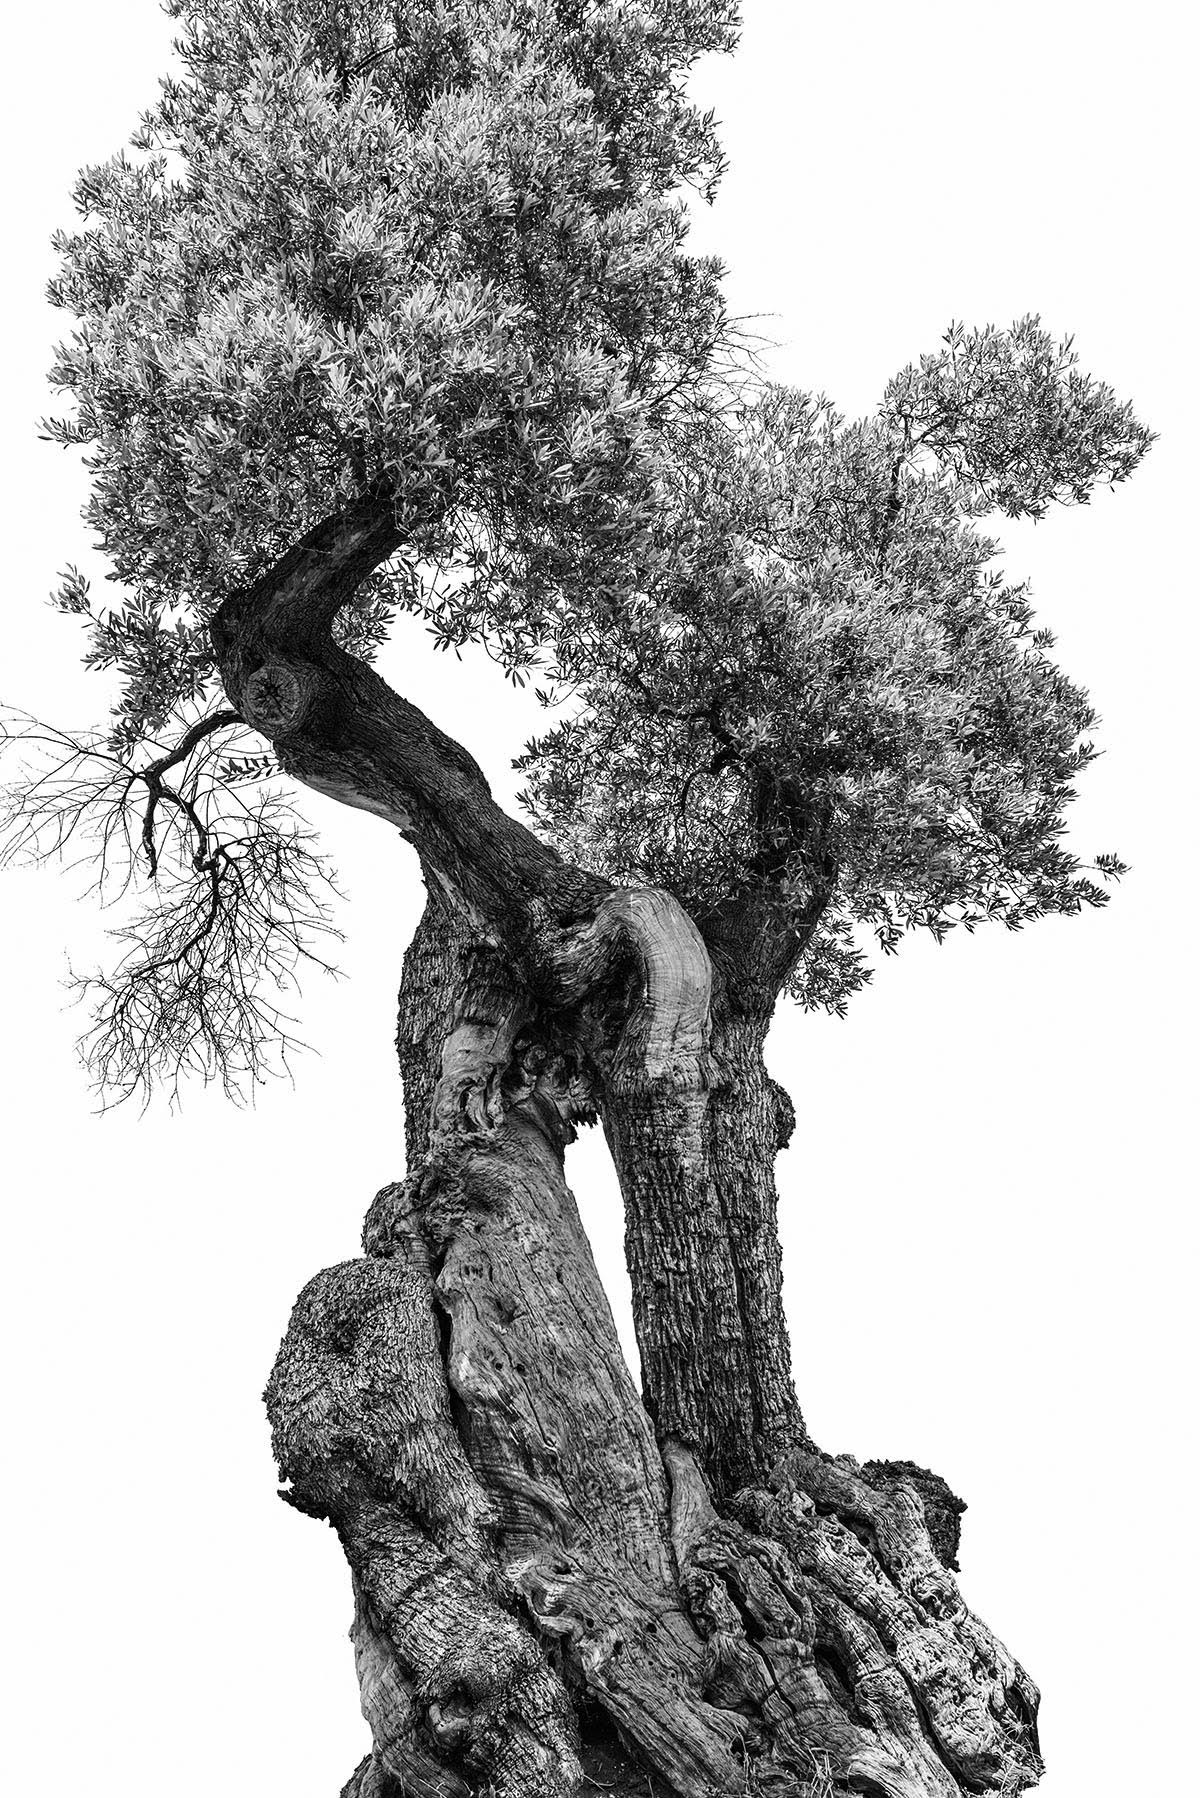 martin-ogolter-Monumentali-nature-landscape-photographer-10